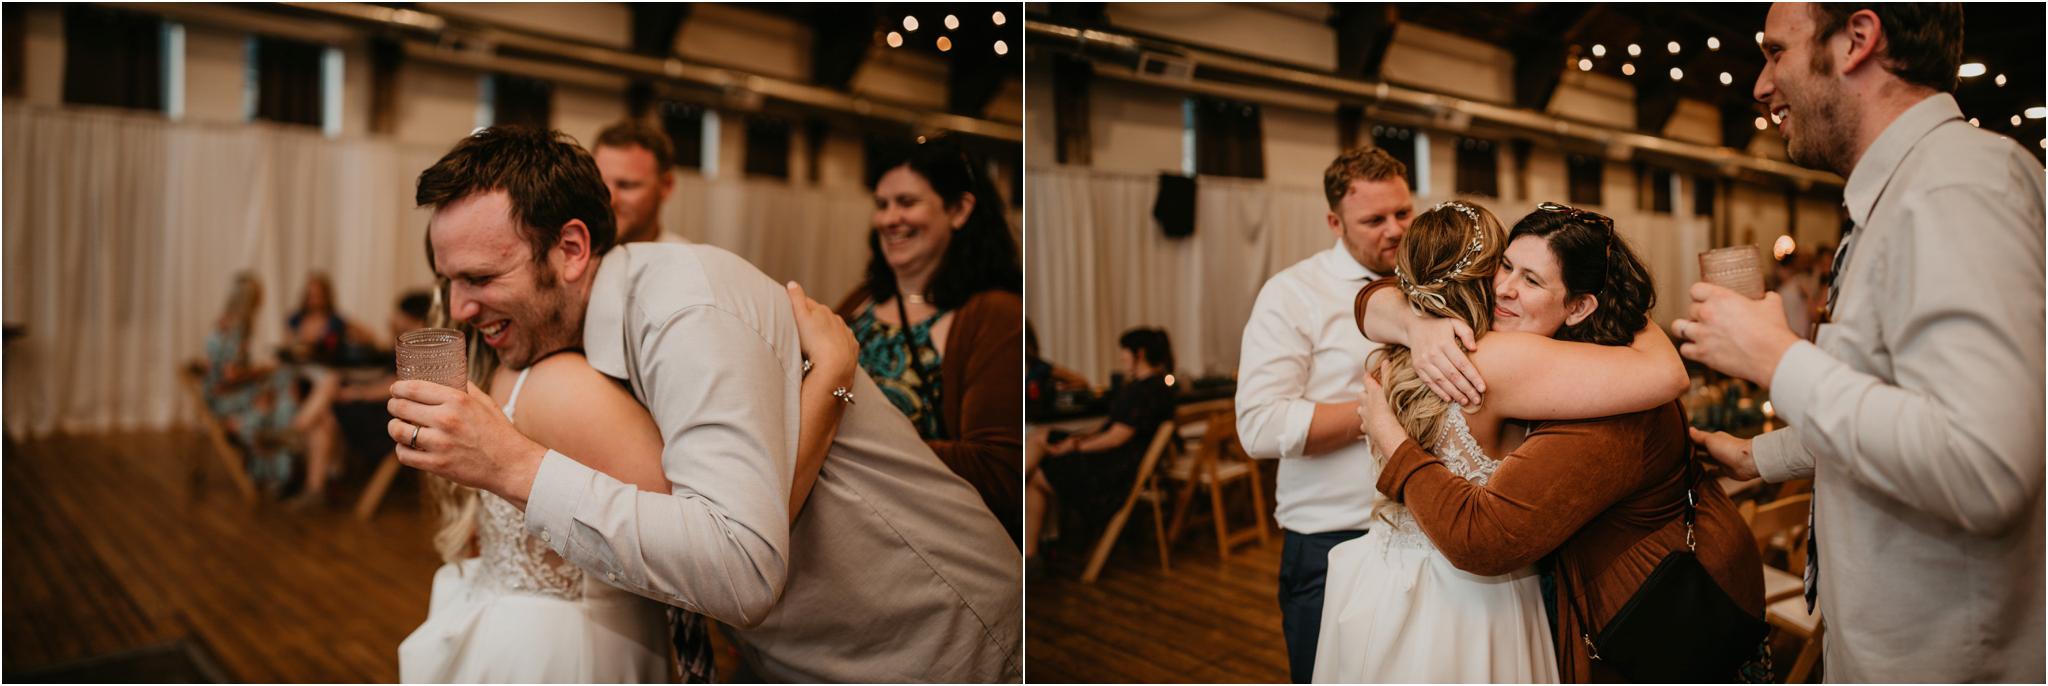 laura-and-matt-metropolist-urban-seattle-wedding-photographer-169.jpg